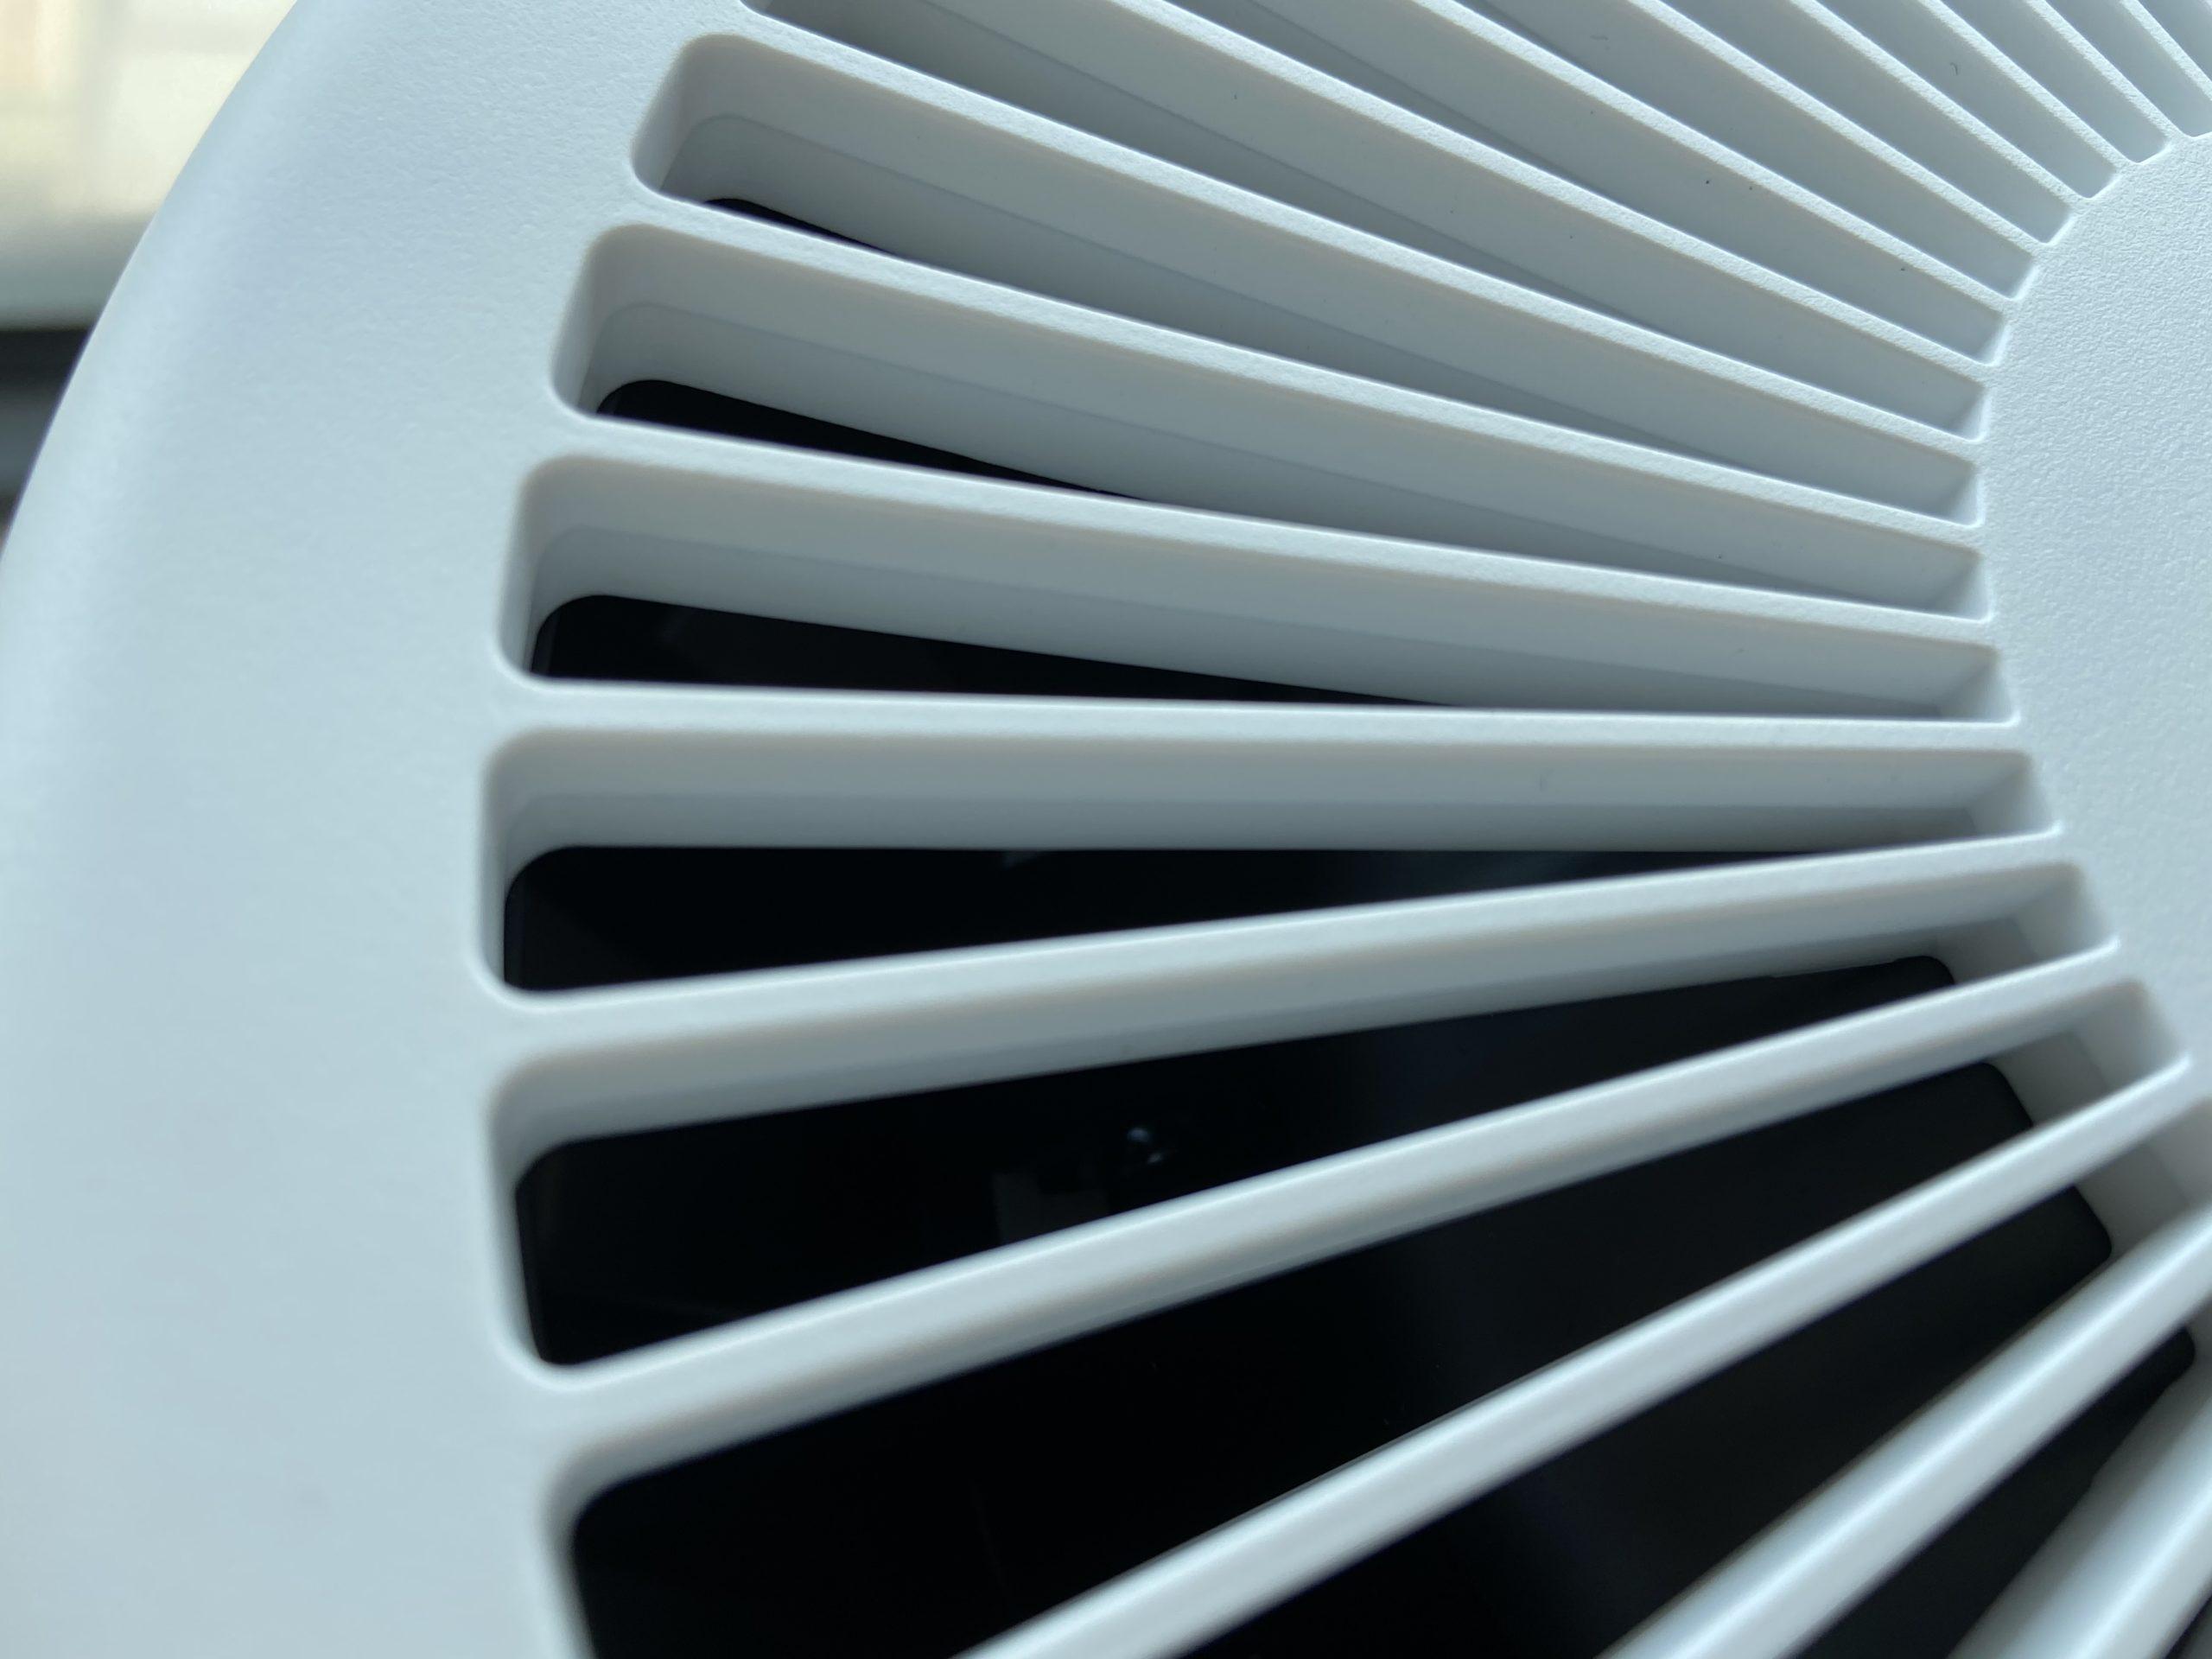 Honeywell HPA 830 淨香氛空氣清淨機 出風口位置